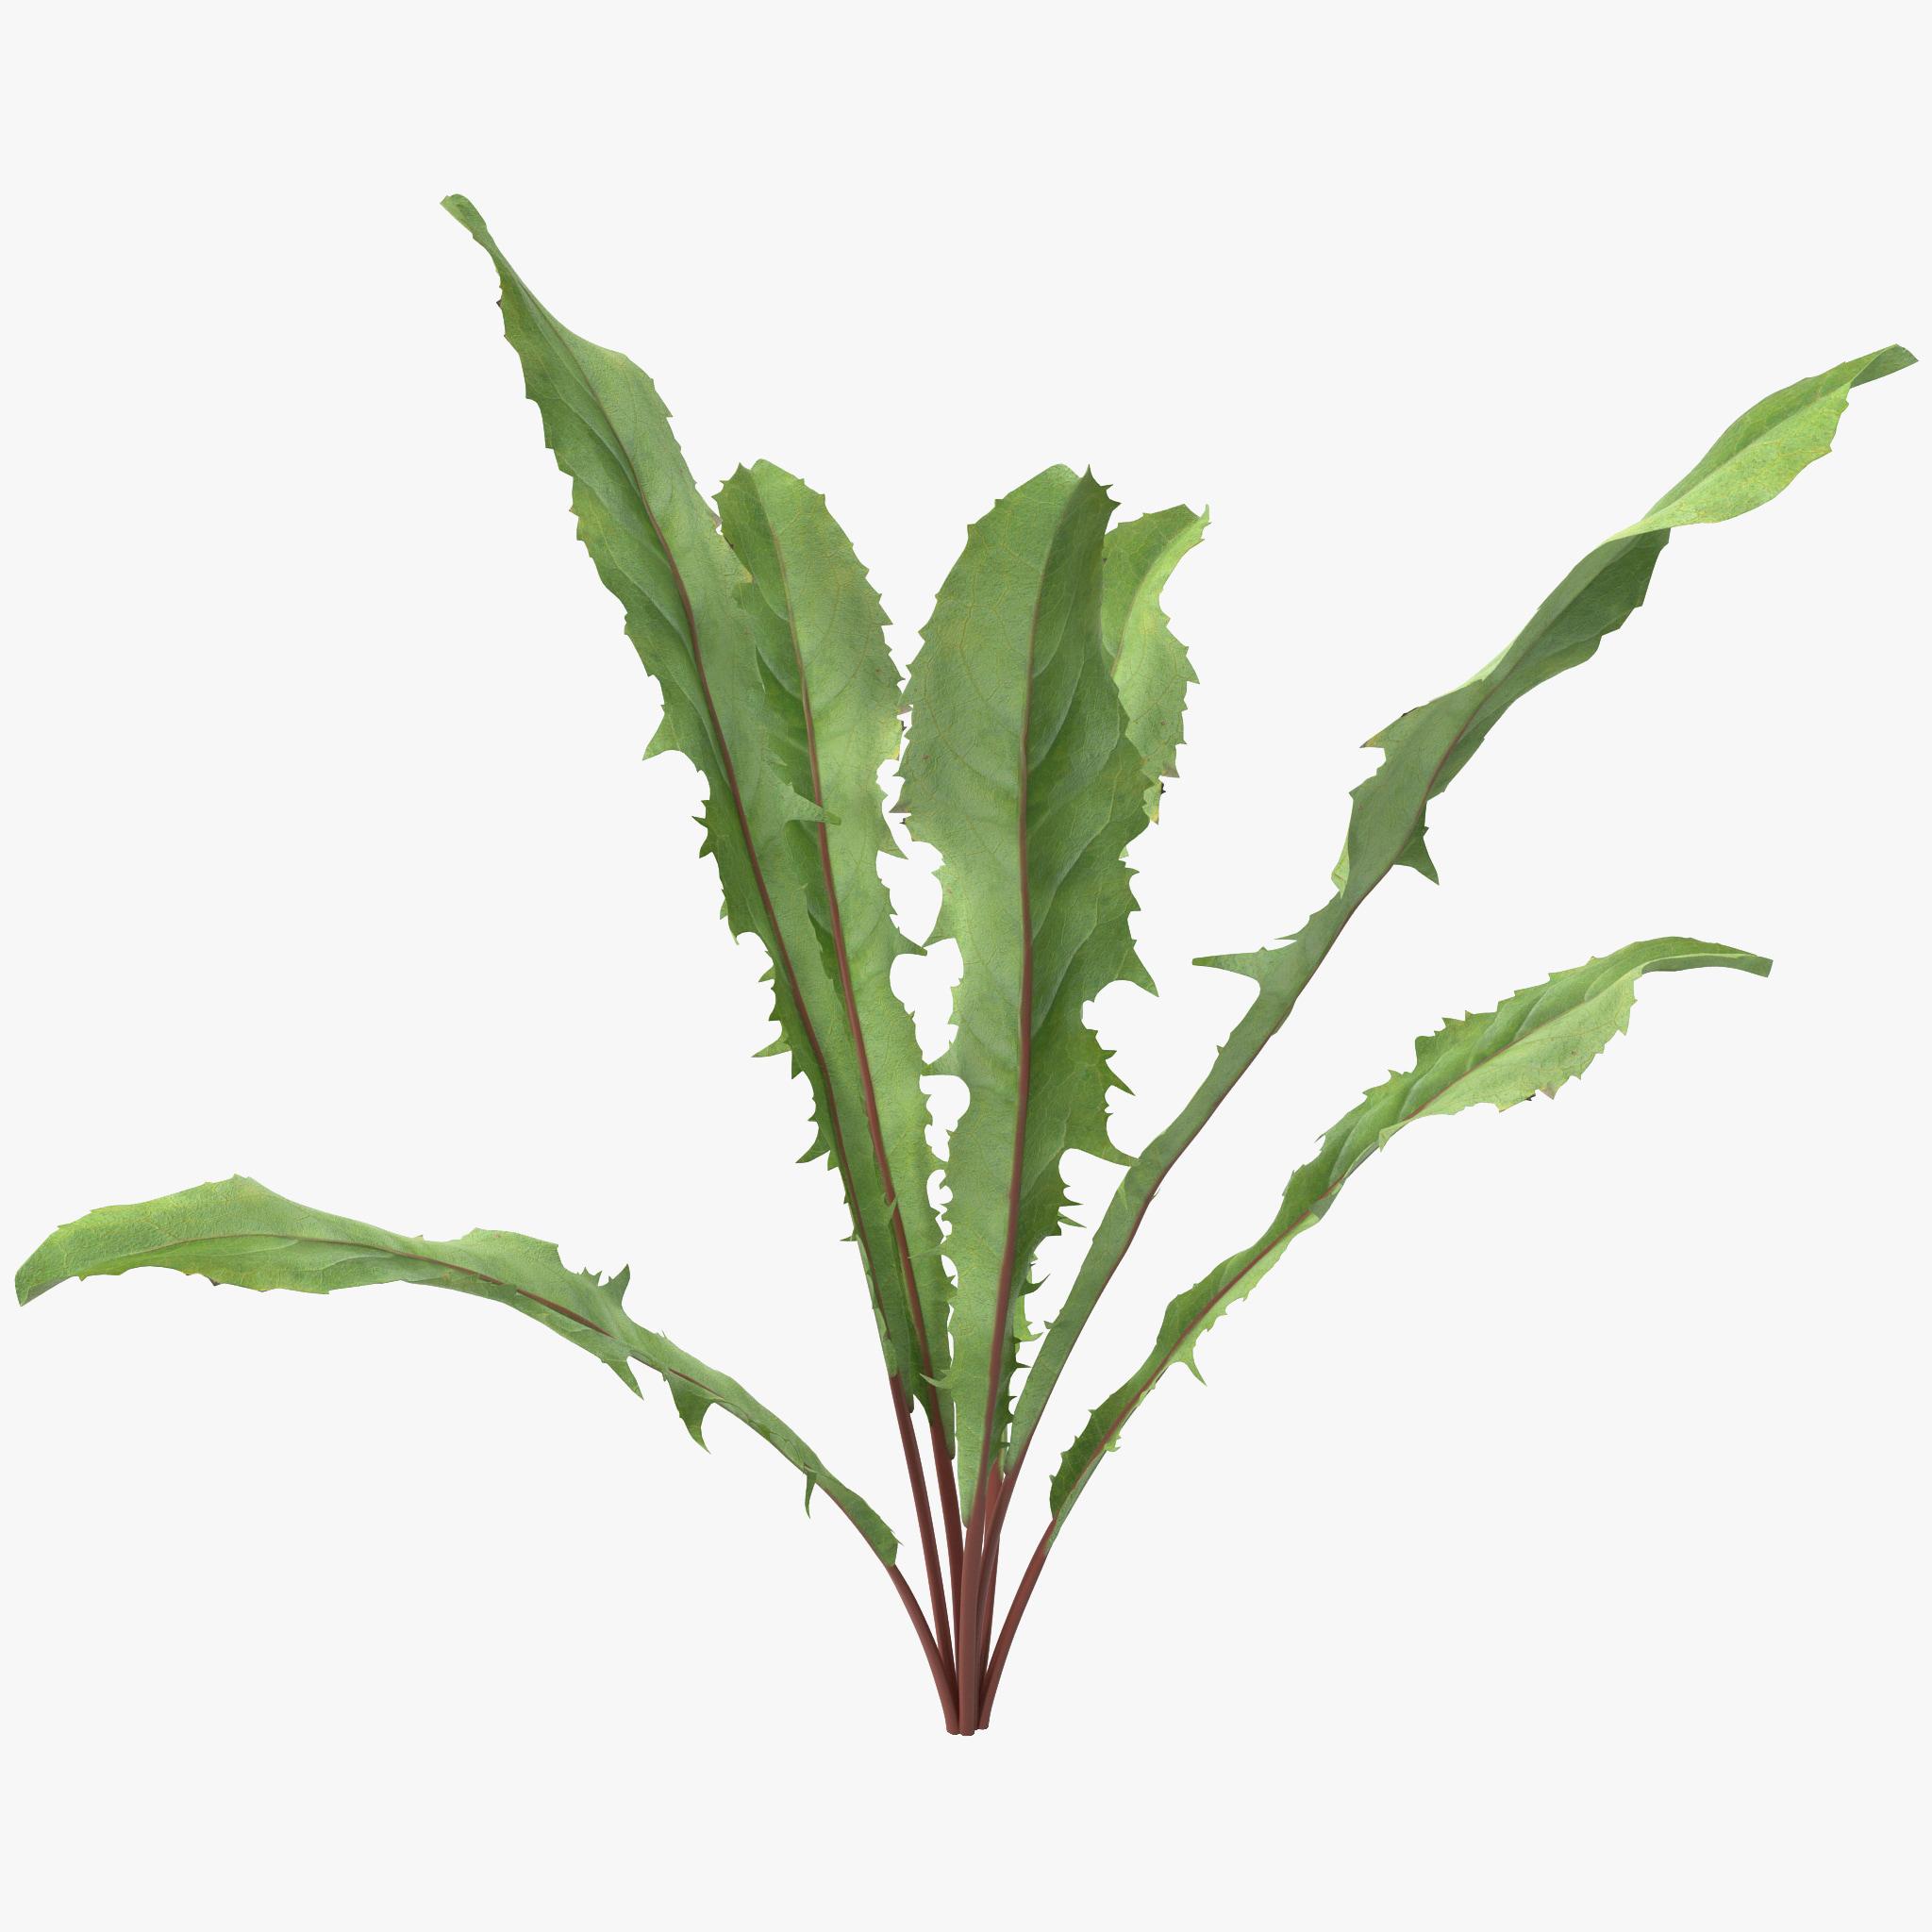 Dandelion Green Plant_1.jpg